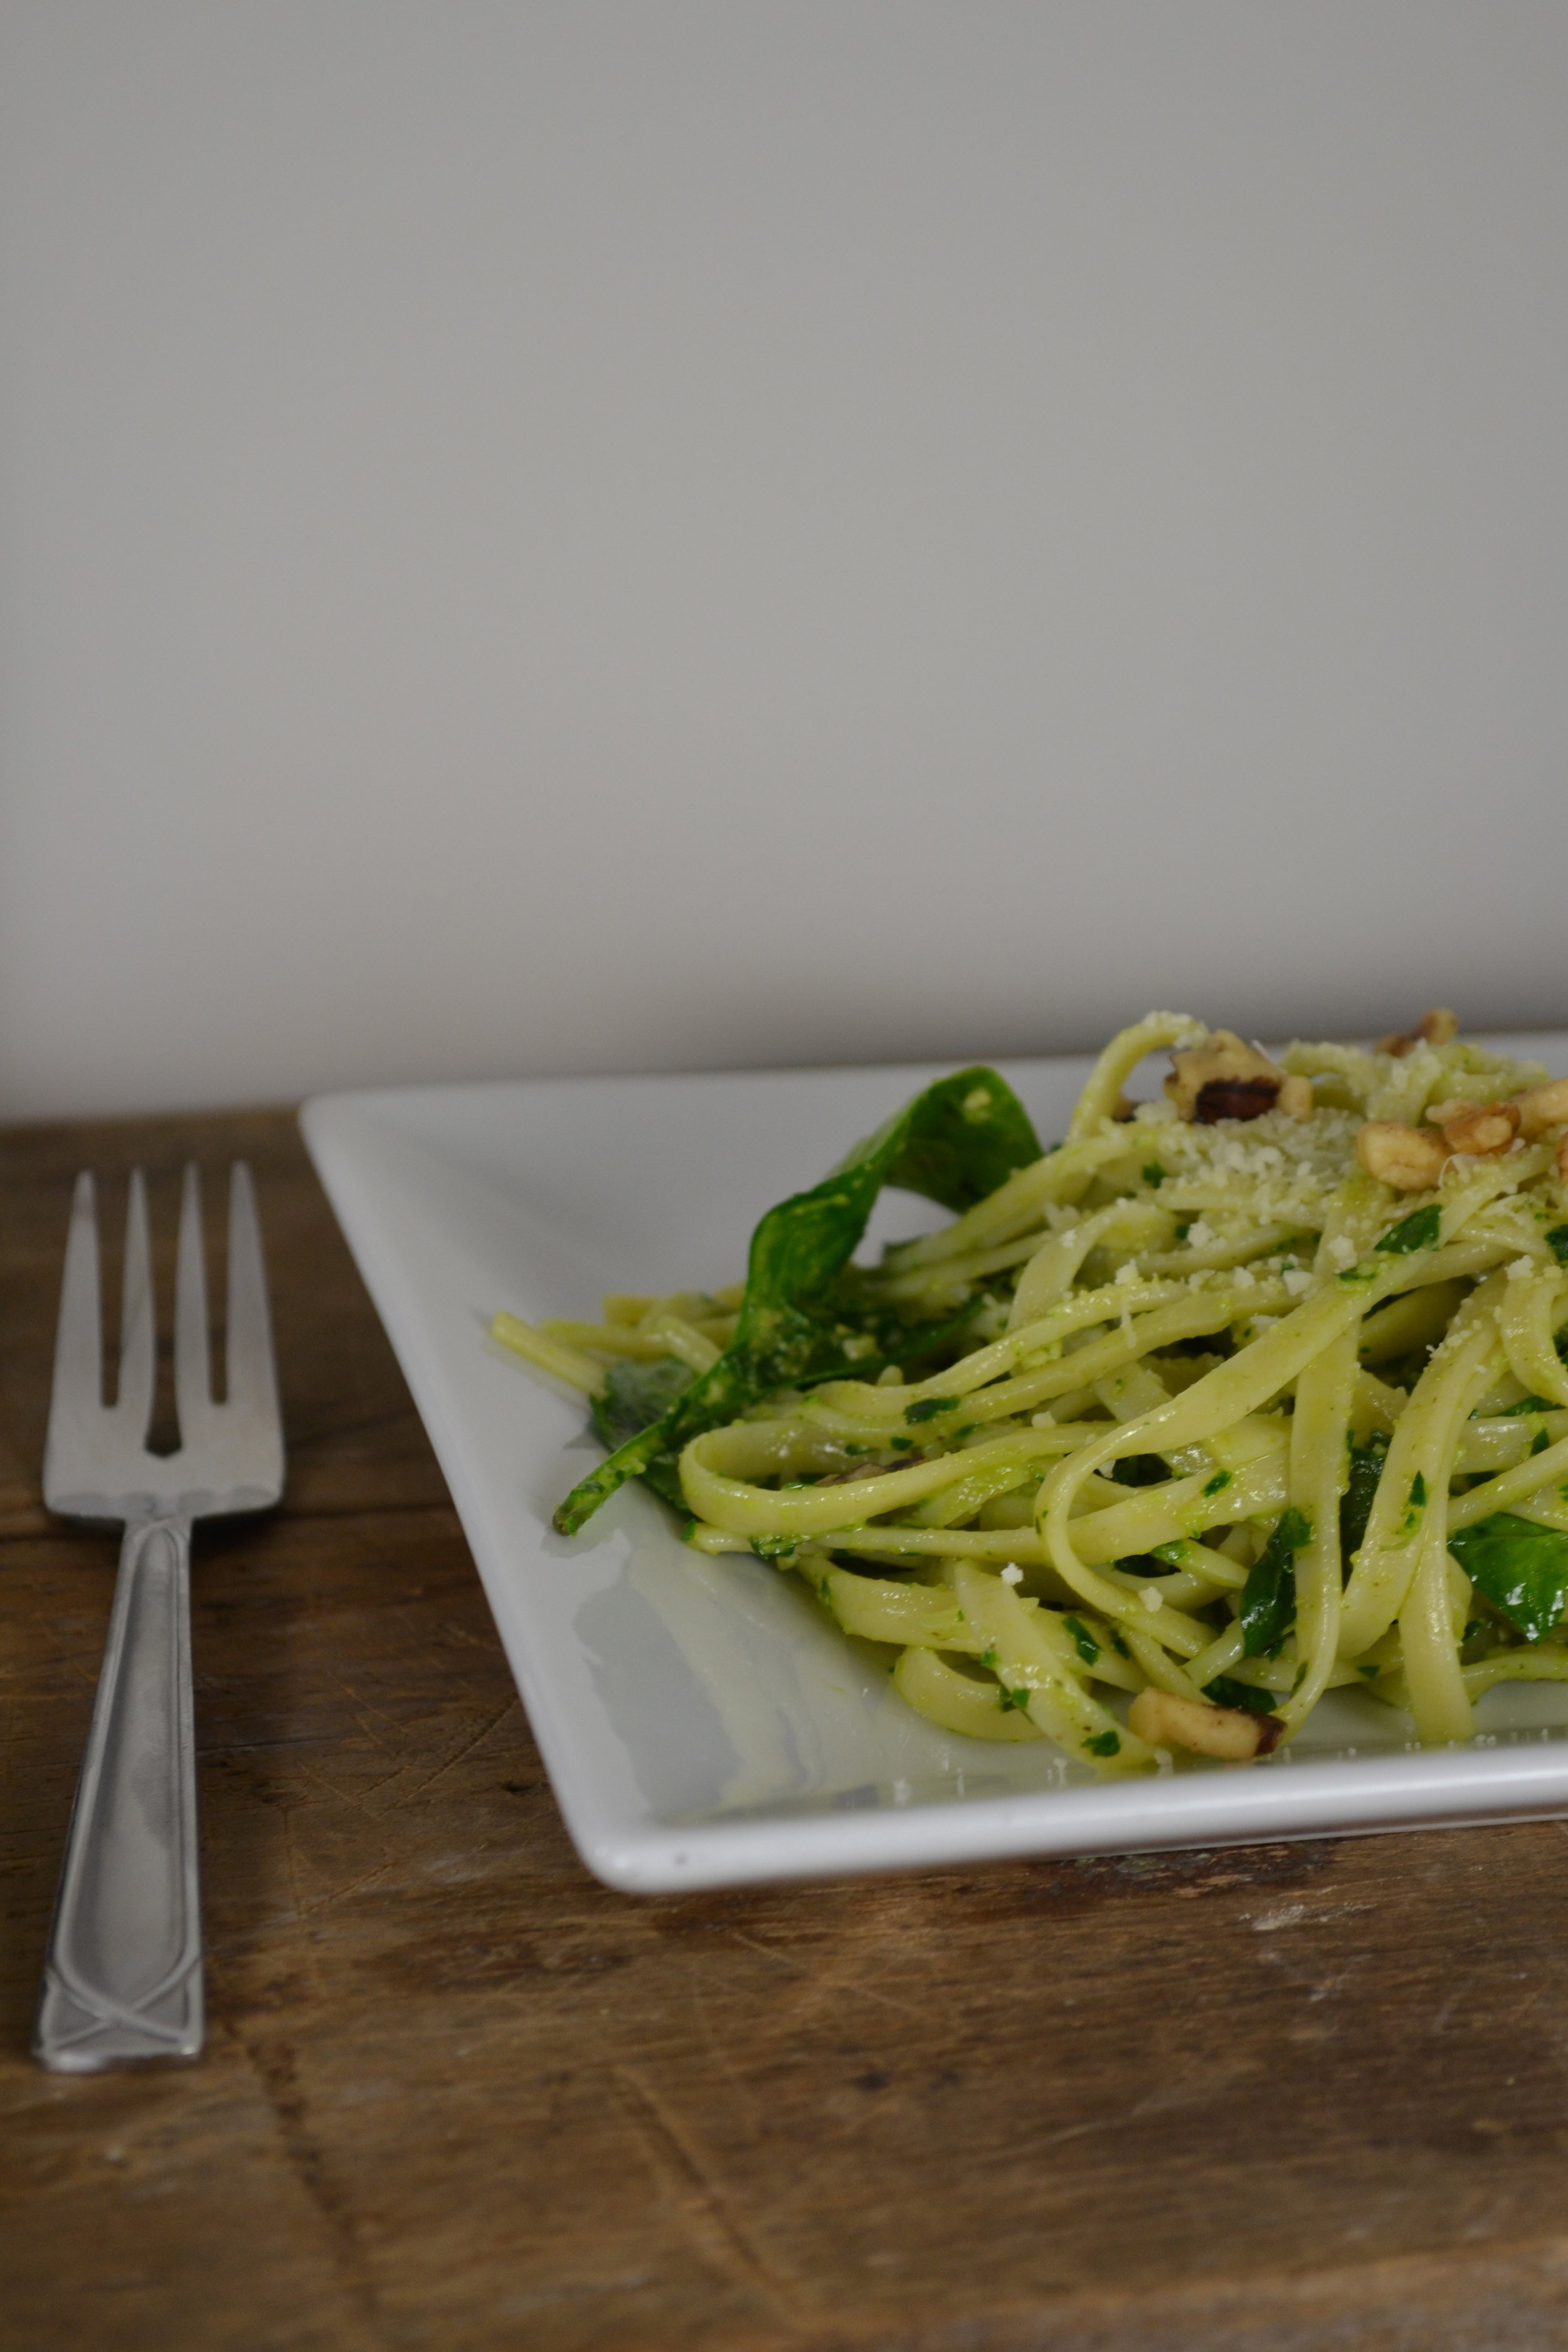 Fettuccine with parsley pesto 2